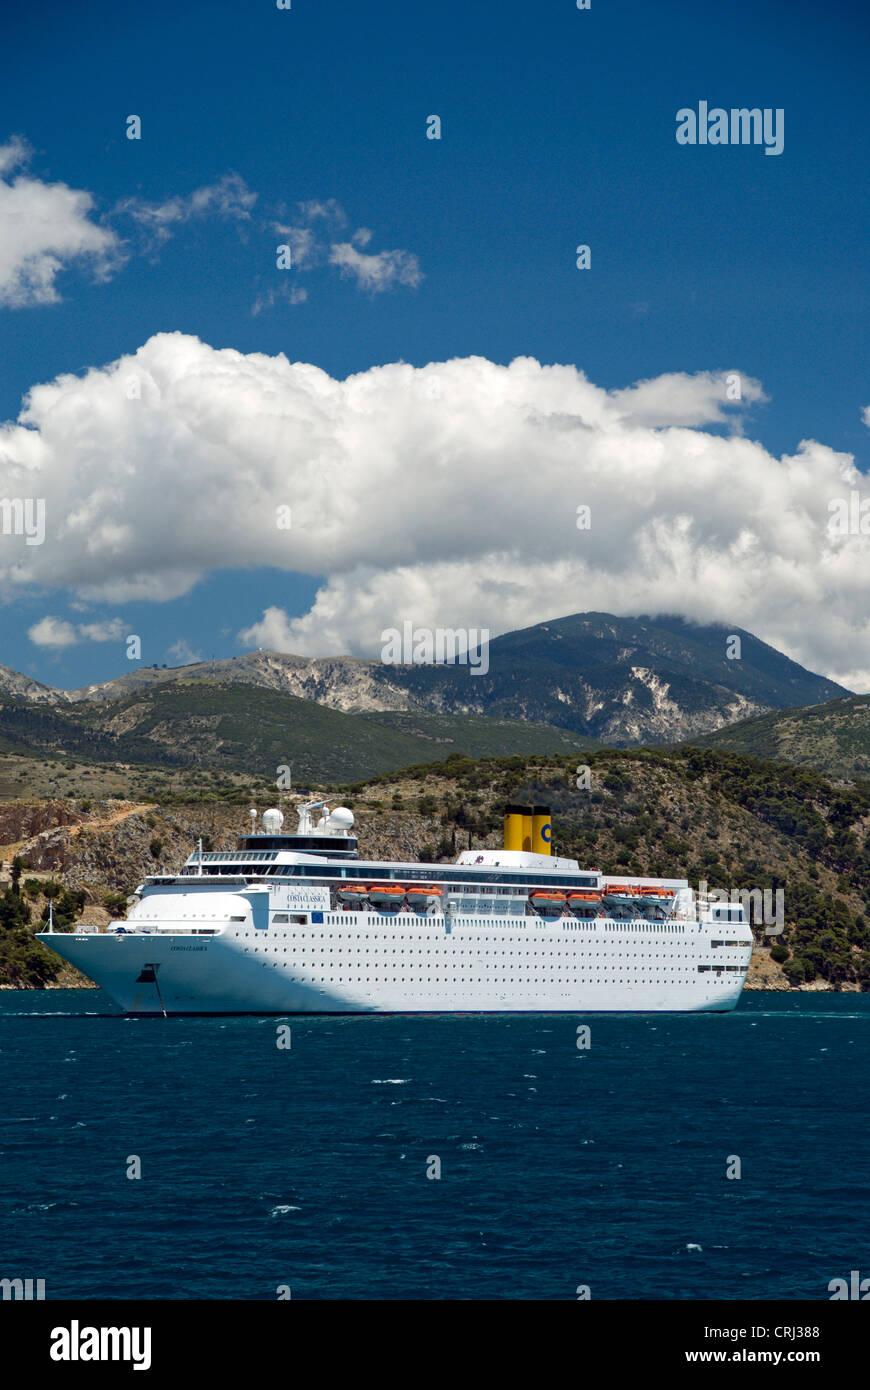 Cruise ship Costa Classica, with Mount Enos in distance, Argostoli Bay, Argostoli, Kefalonia, Ionian Islands,Greece. - Stock Image